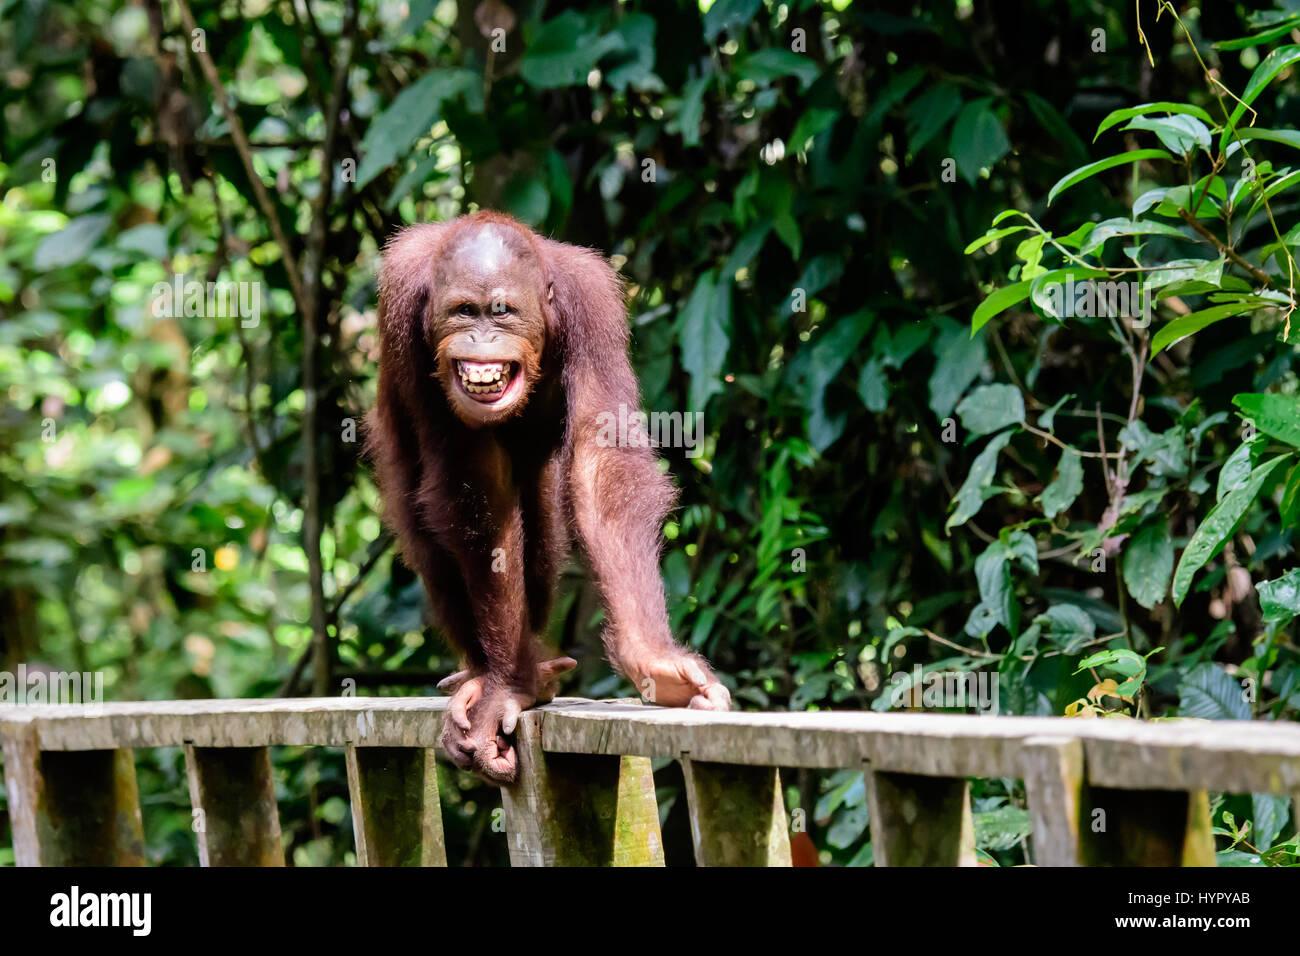 Cheeky grinning Orangutan avvicinando Immagini Stock